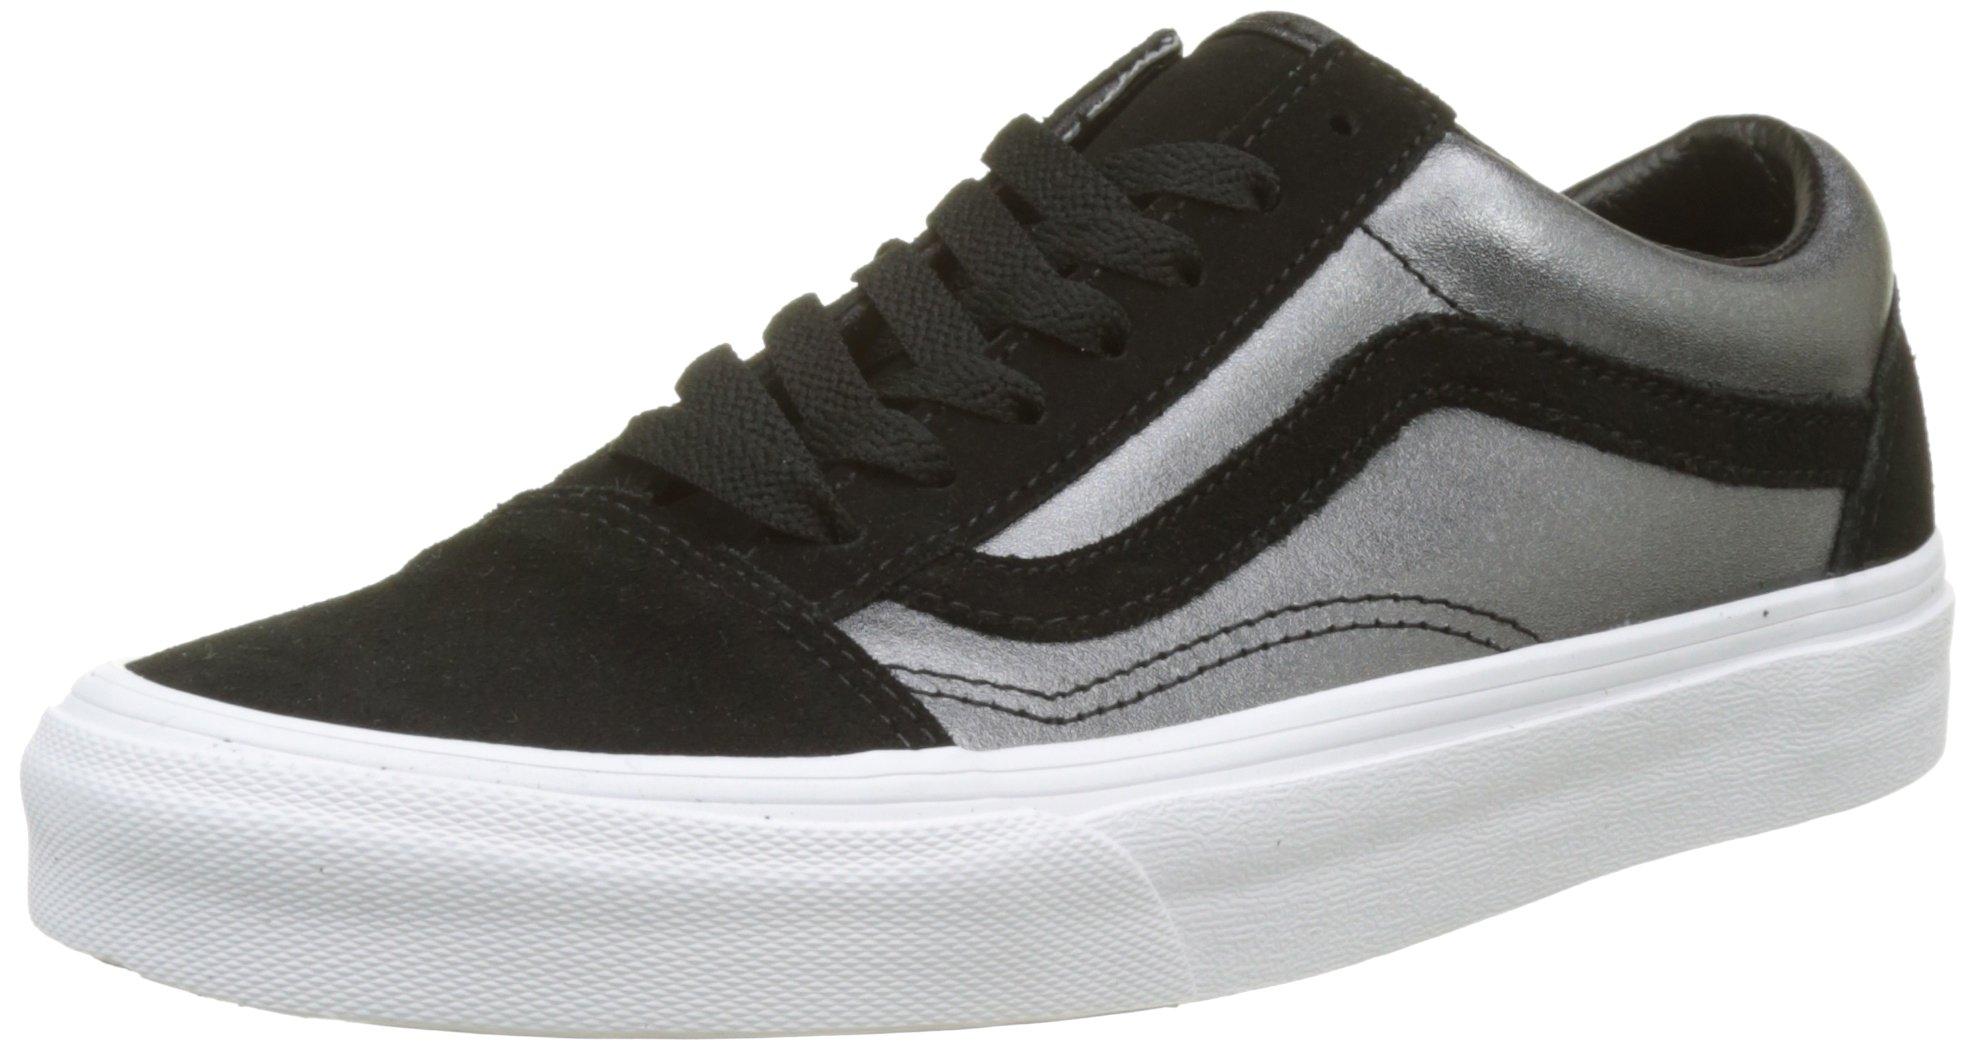 6ef2a20f22c Vans Old Skool Leather Mens Skateboarding-Shoes VN-A38G1QS6 7.5 - Black Two  Tone Metallic